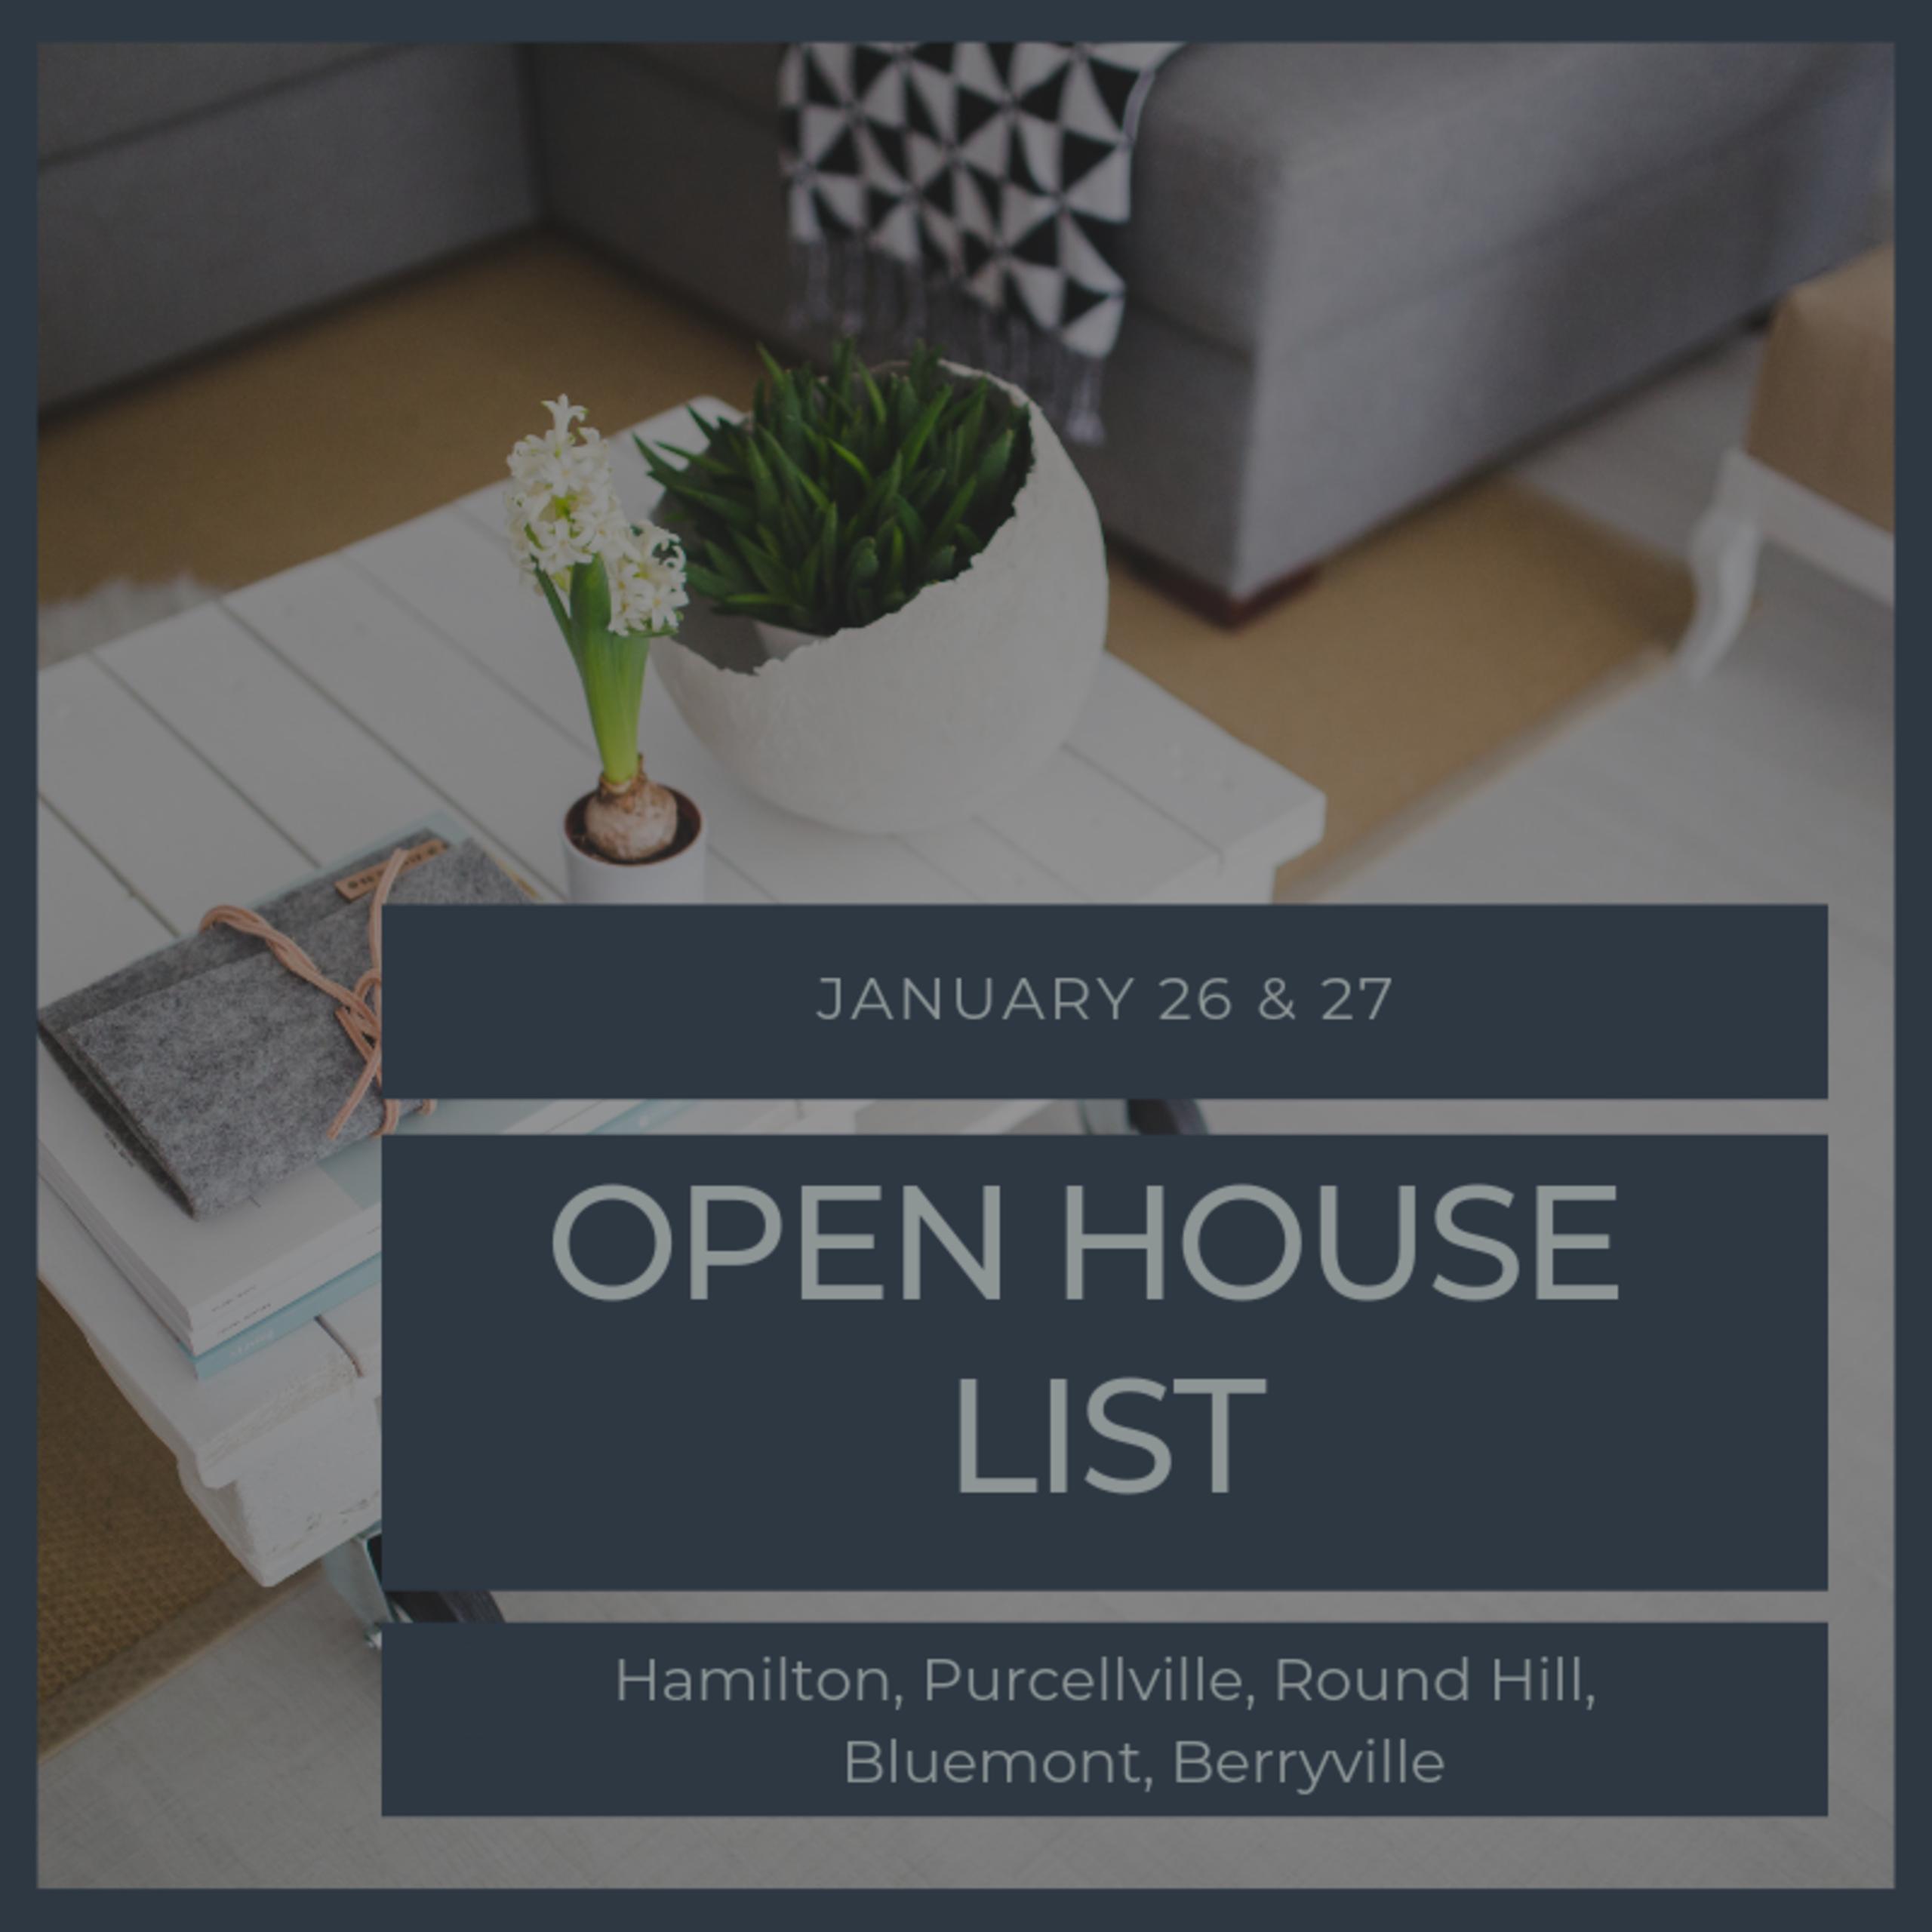 Open House List 1/26/19 – 1/27/19